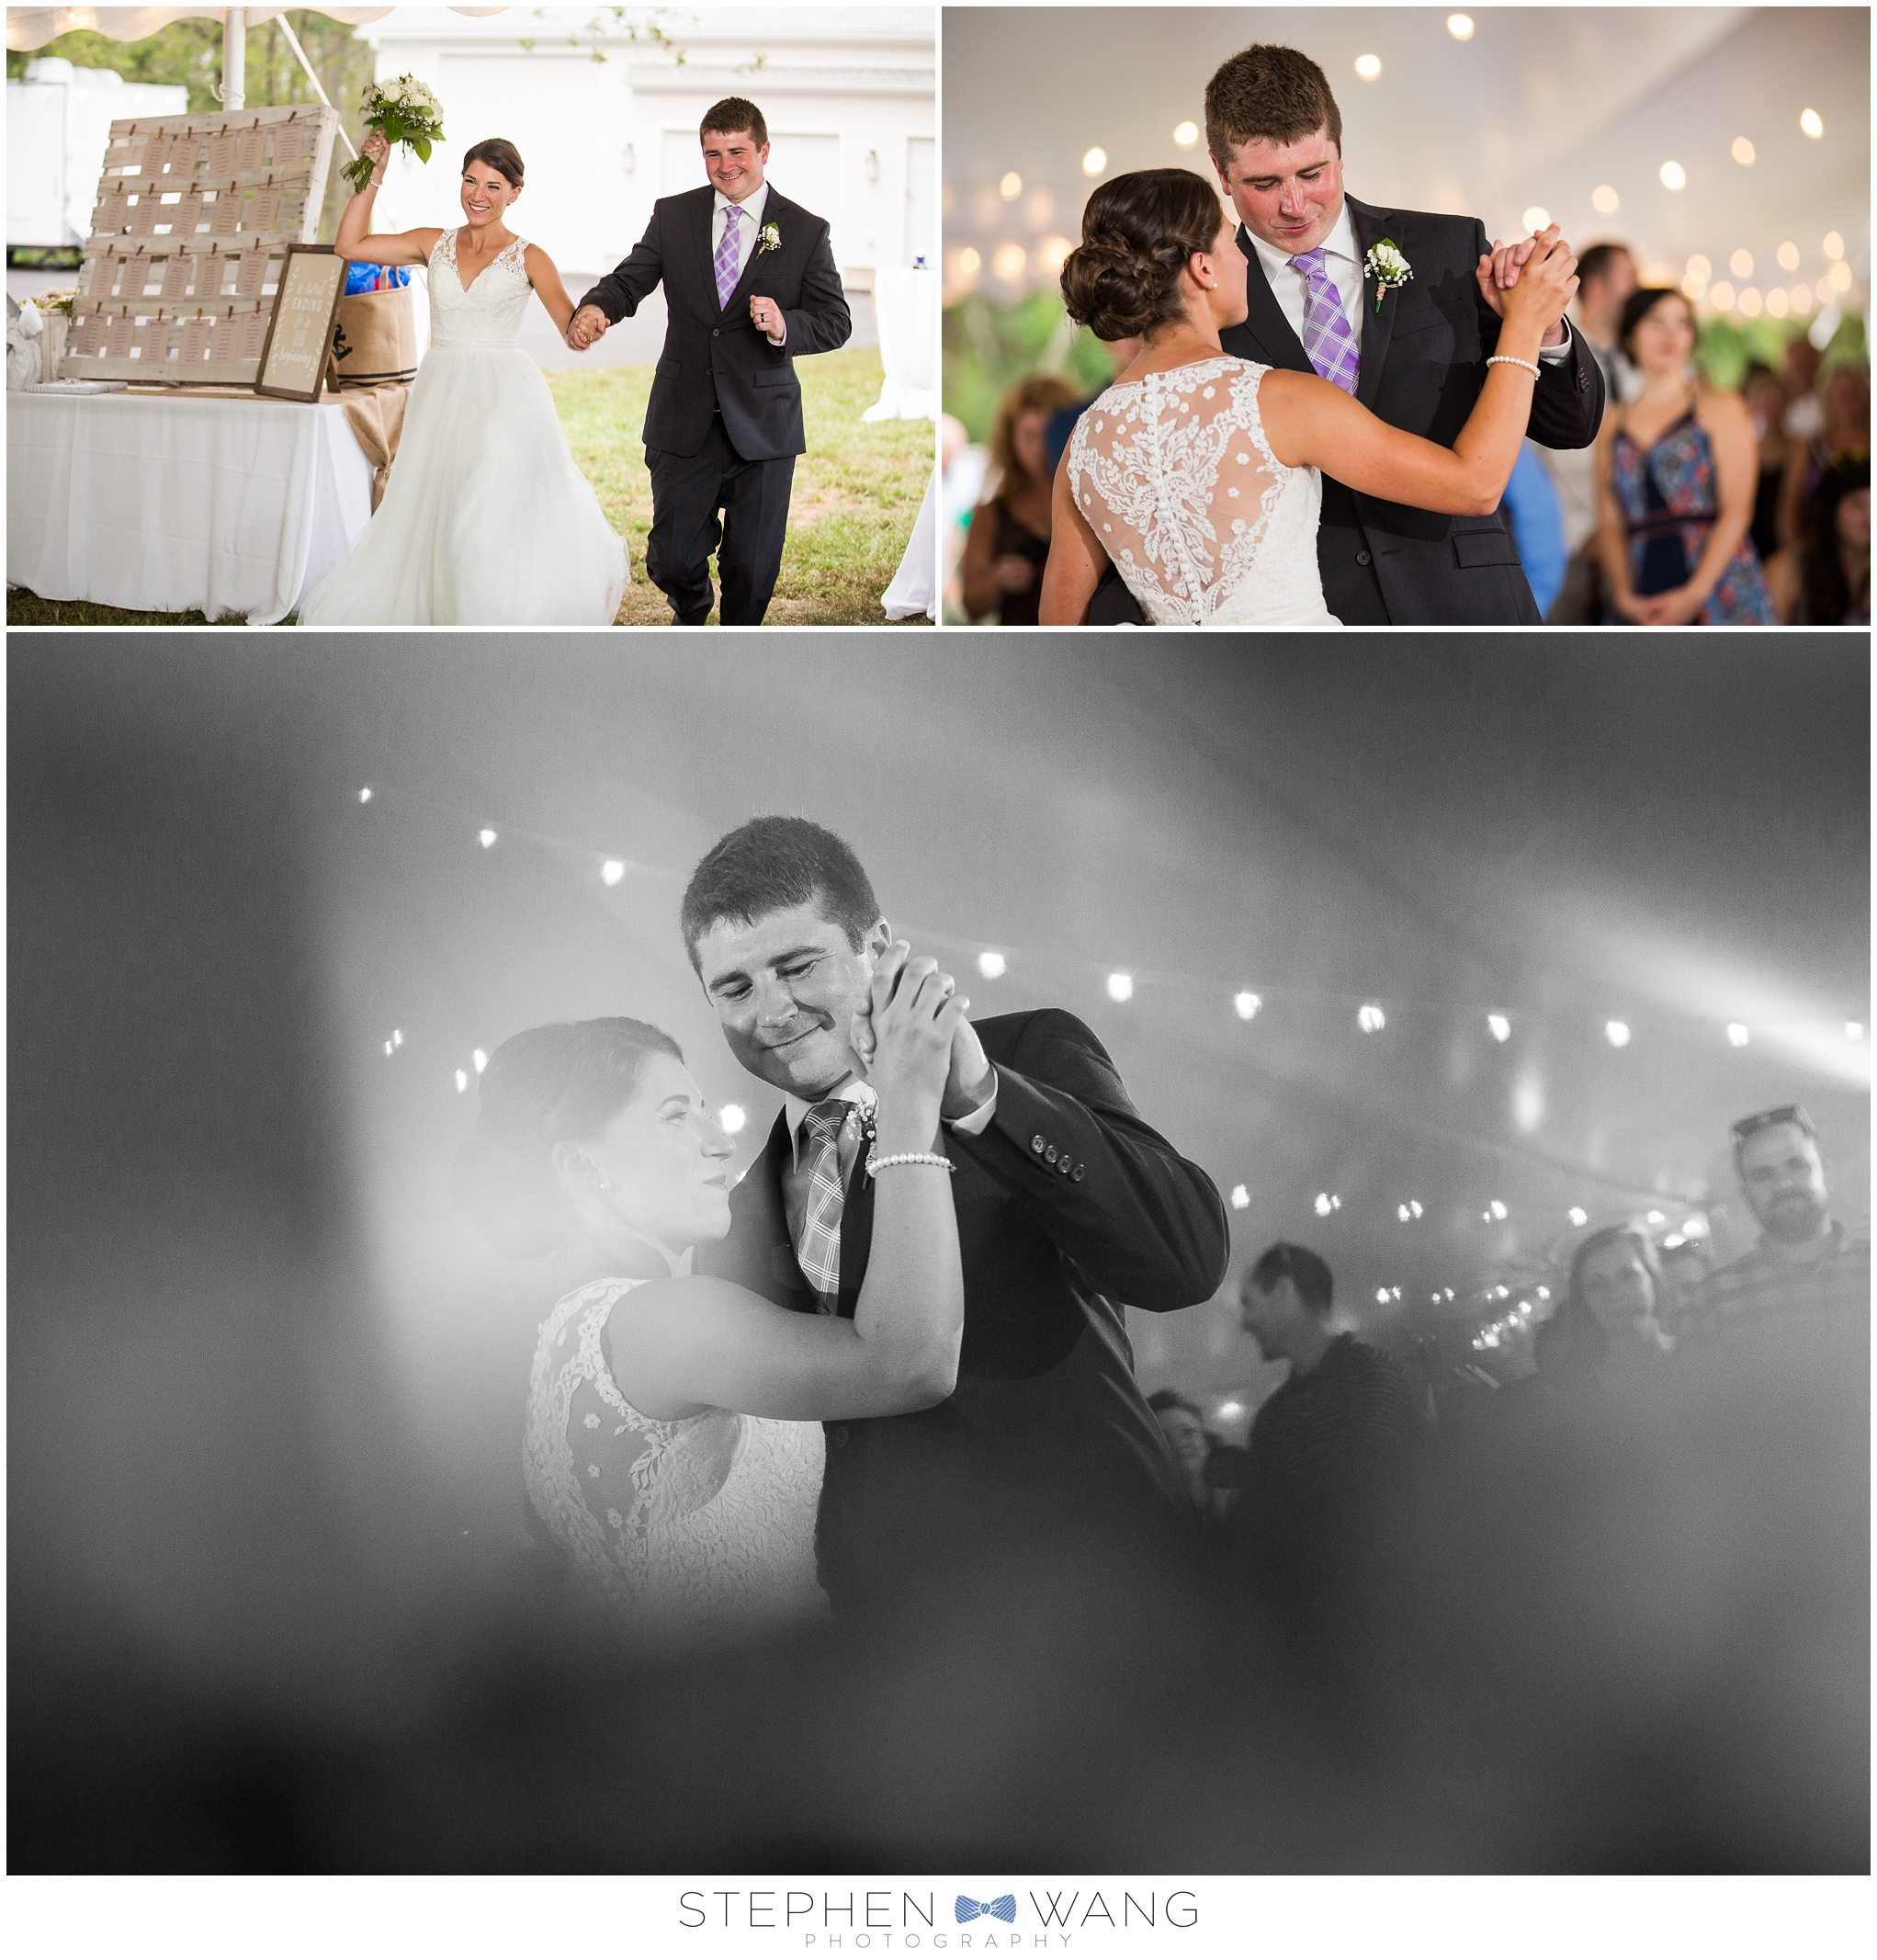 Stephen Wang Photography wedding photographer haddam connecticut wedding connecticut photographer philadlephia photographer pennsylvania wedding photographer bride and groom00031.jpg